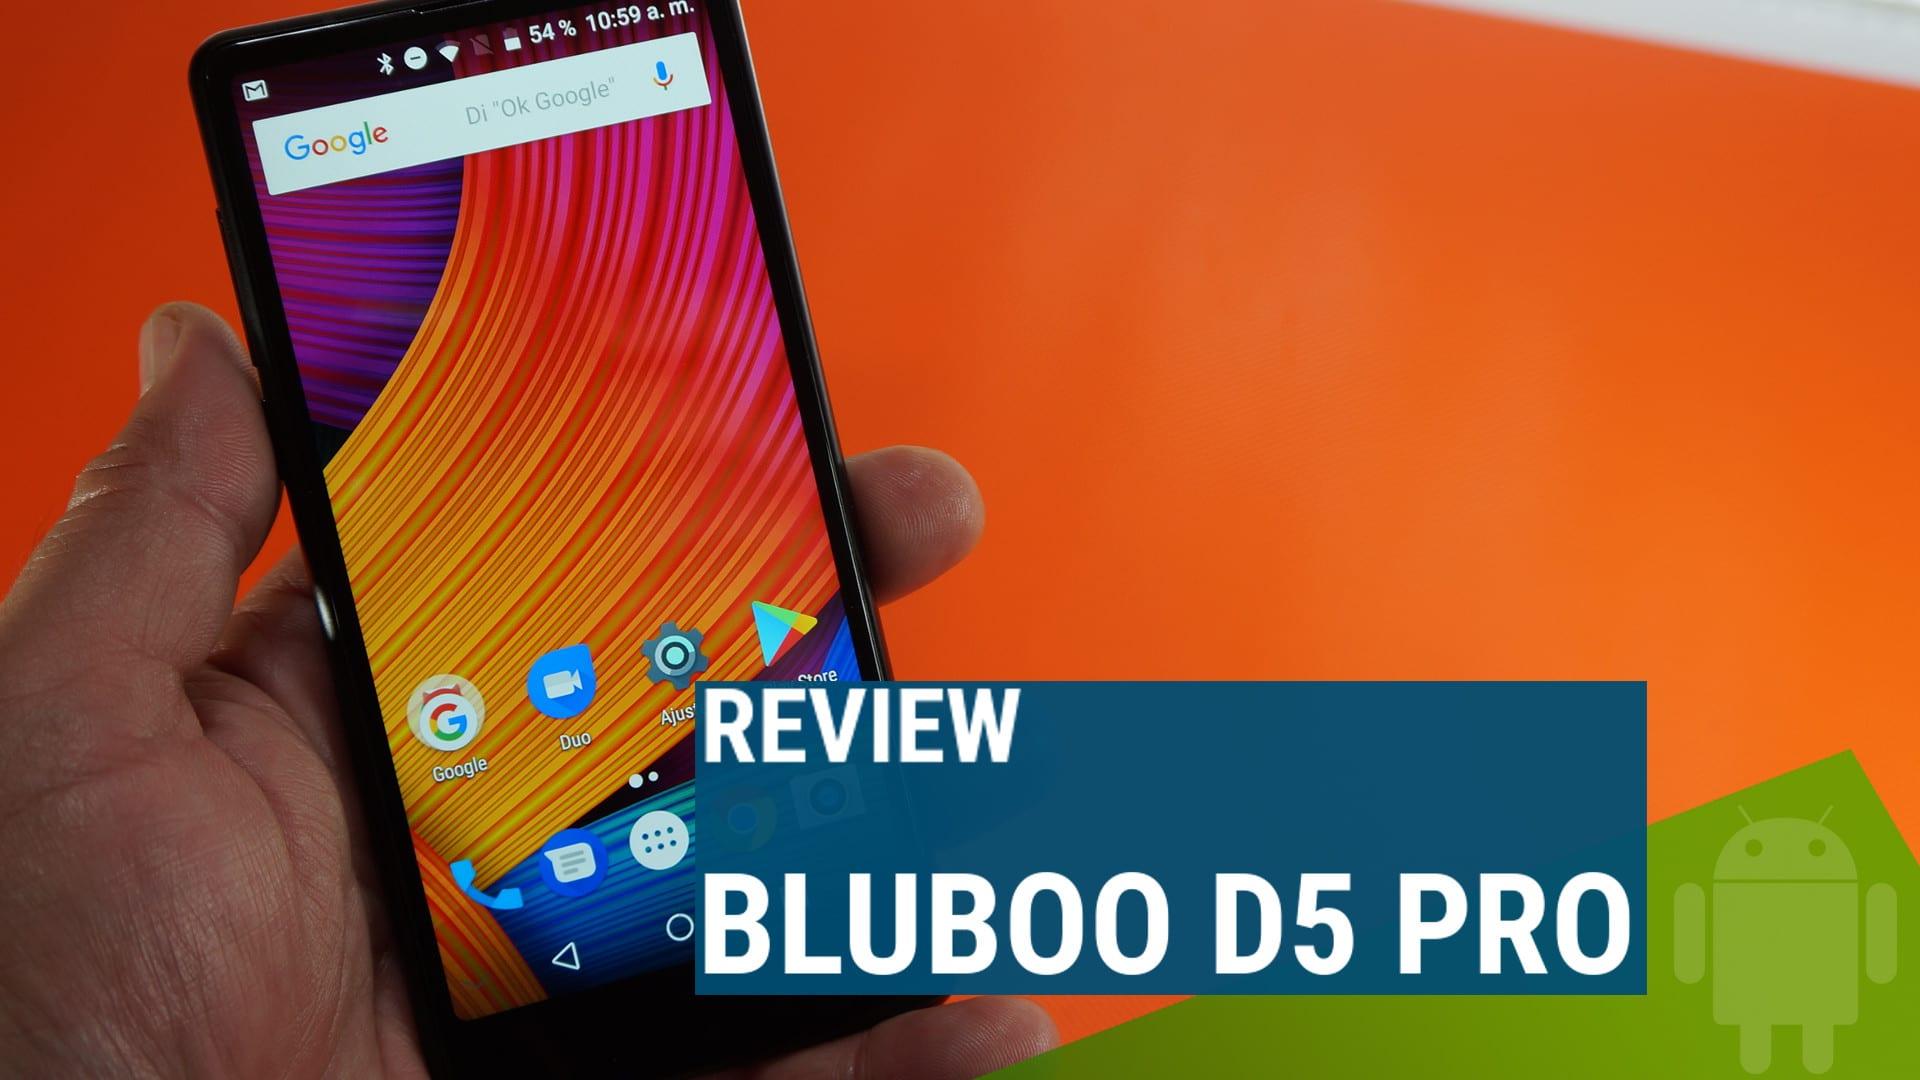 Rwview Bluboo D5 PRO